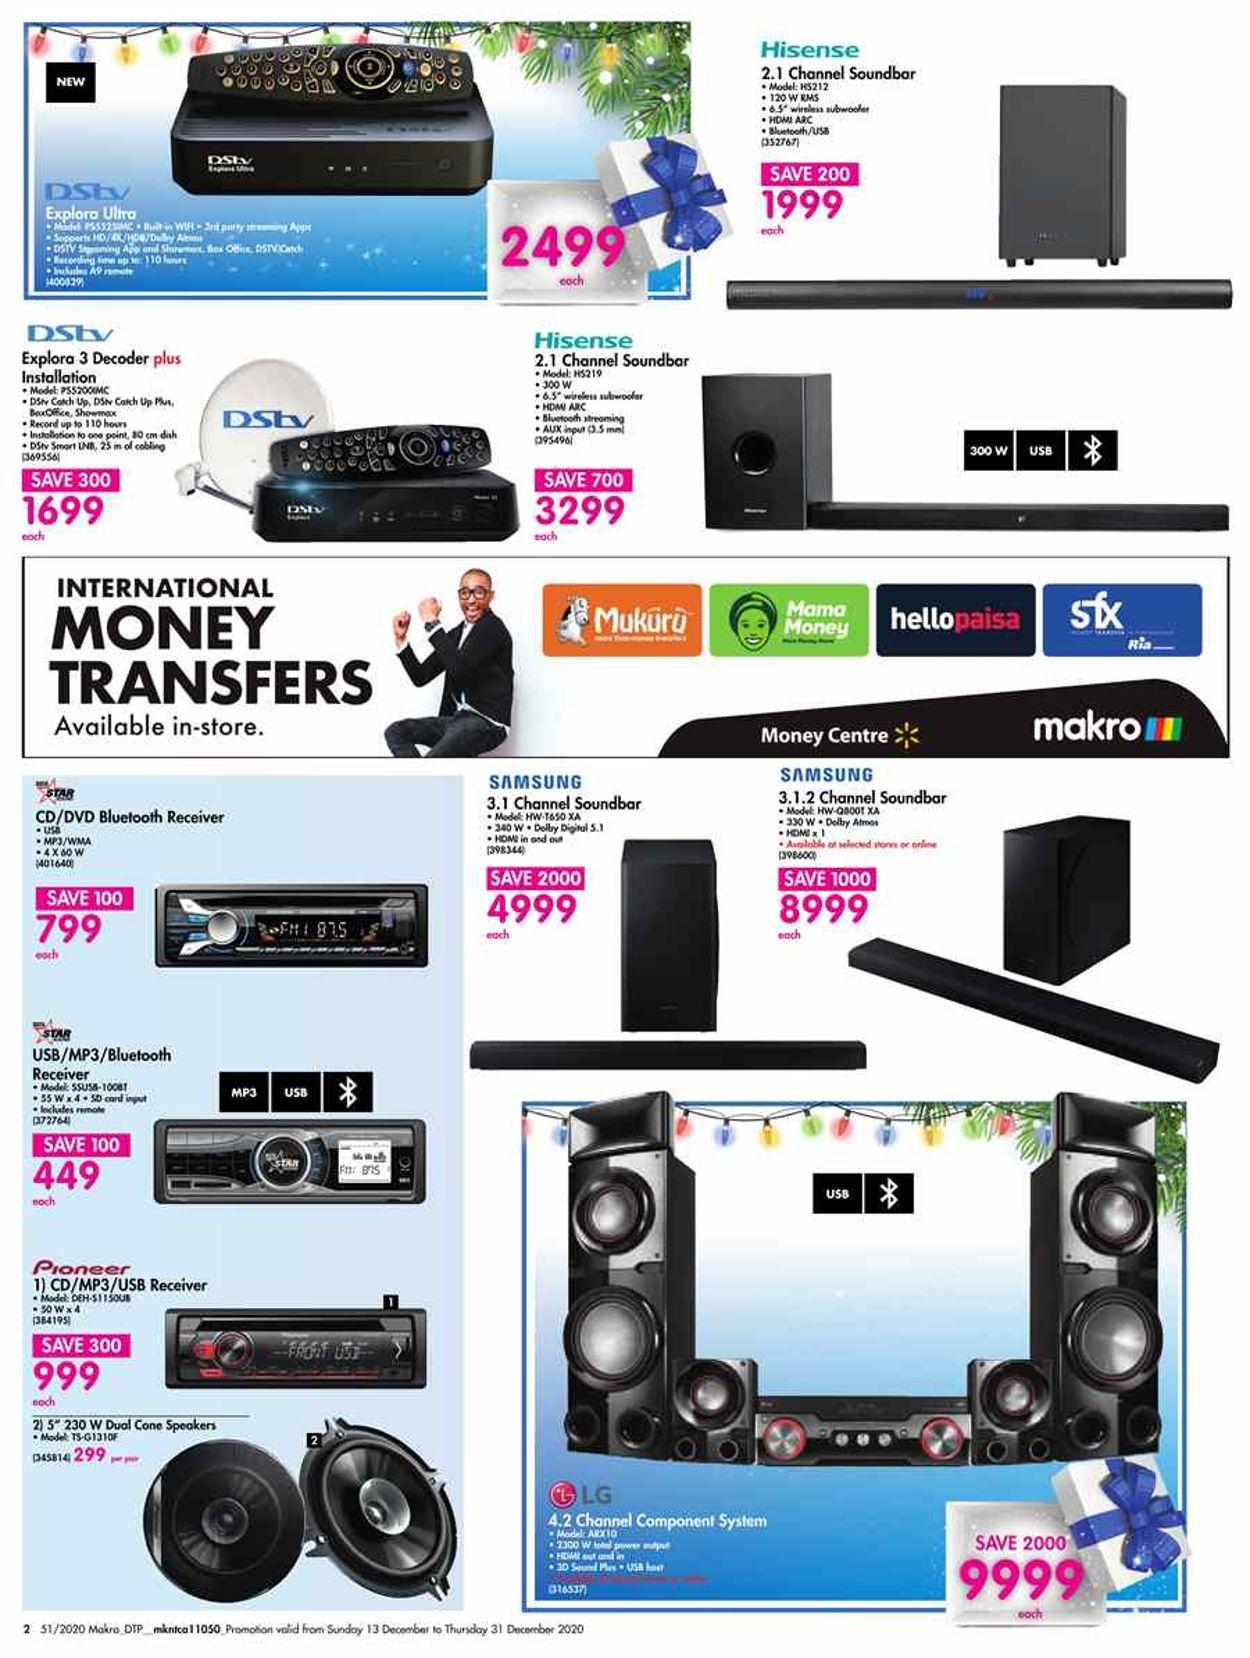 Makro Christmas Savings 2020 Catalogue - 2020/12/13-2020/12/31 (Page 2)